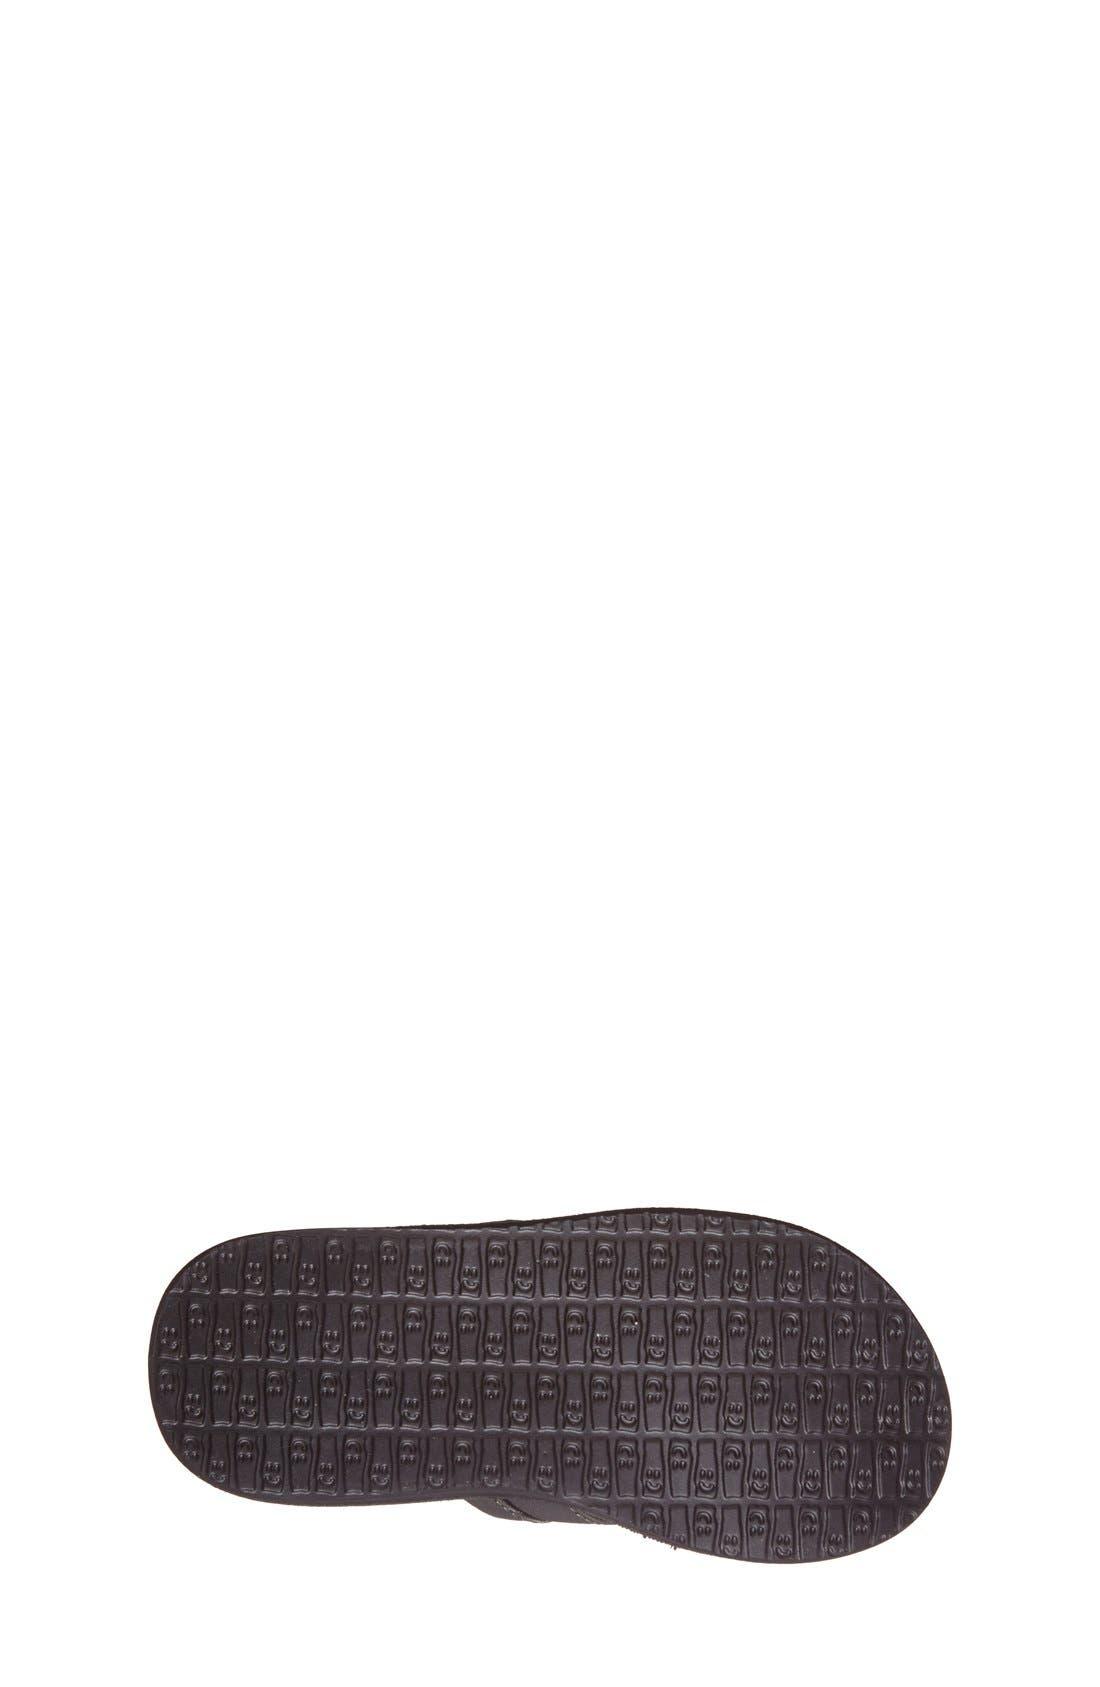 'Rootbeer Cozy' Lightweight Flip Flop Sandal,                             Alternate thumbnail 4, color,                             Black